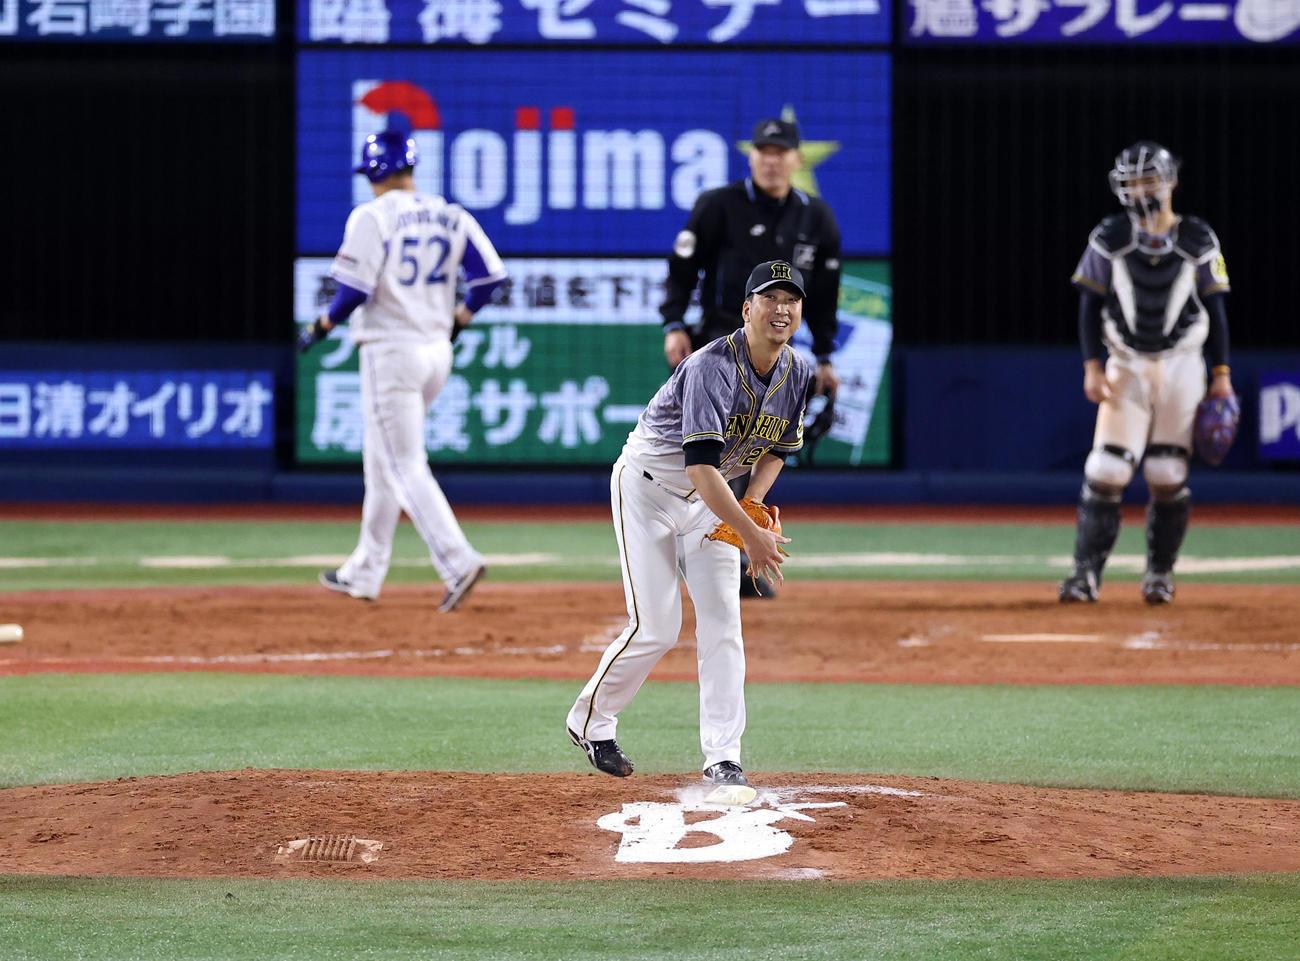 DeNA対阪神 9回裏DeNA2死二塁、大和に左越え2点本塁打を許した藤川はマウンドで苦笑する(撮影・浅見桂子)